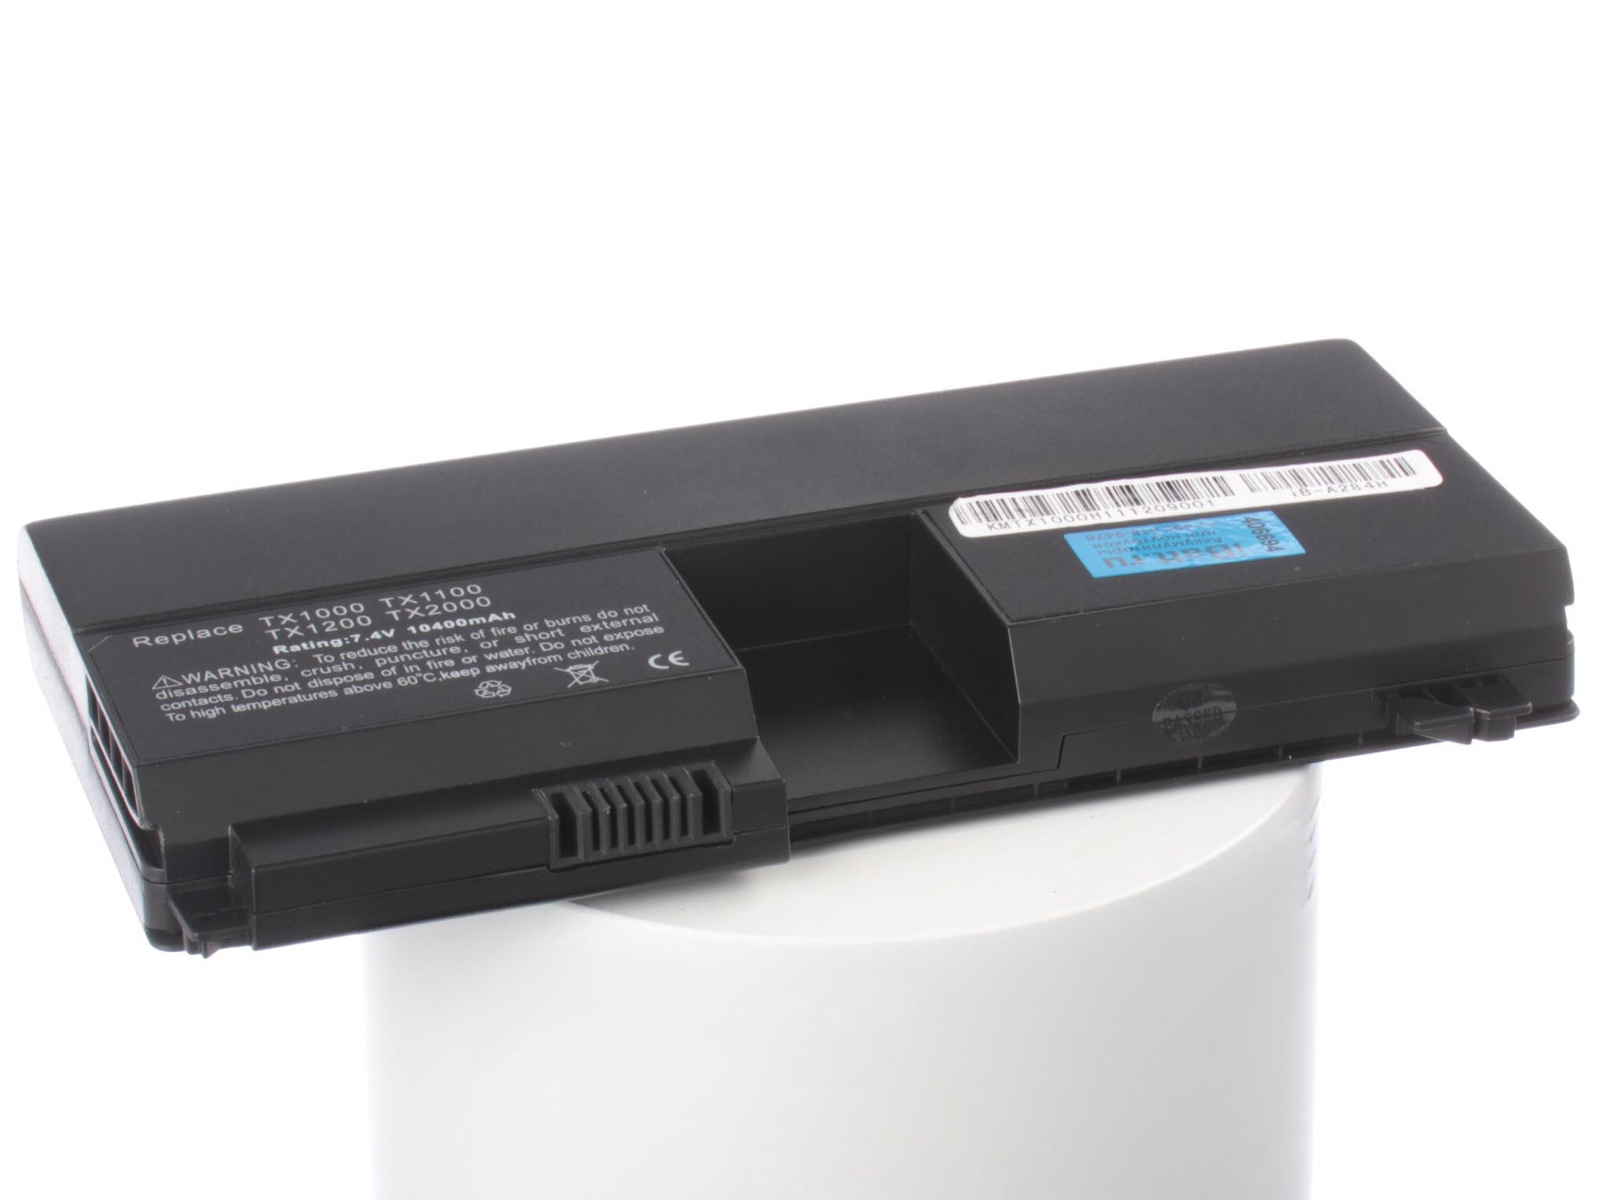 Фото - Аккумулятор для ноутбука iBatt HP-Compaq HSTNN-UB76, HSTNN-OB37, 431325-321, RQ203AA, HSTNN-UB37, 437403-541 аккумулятор